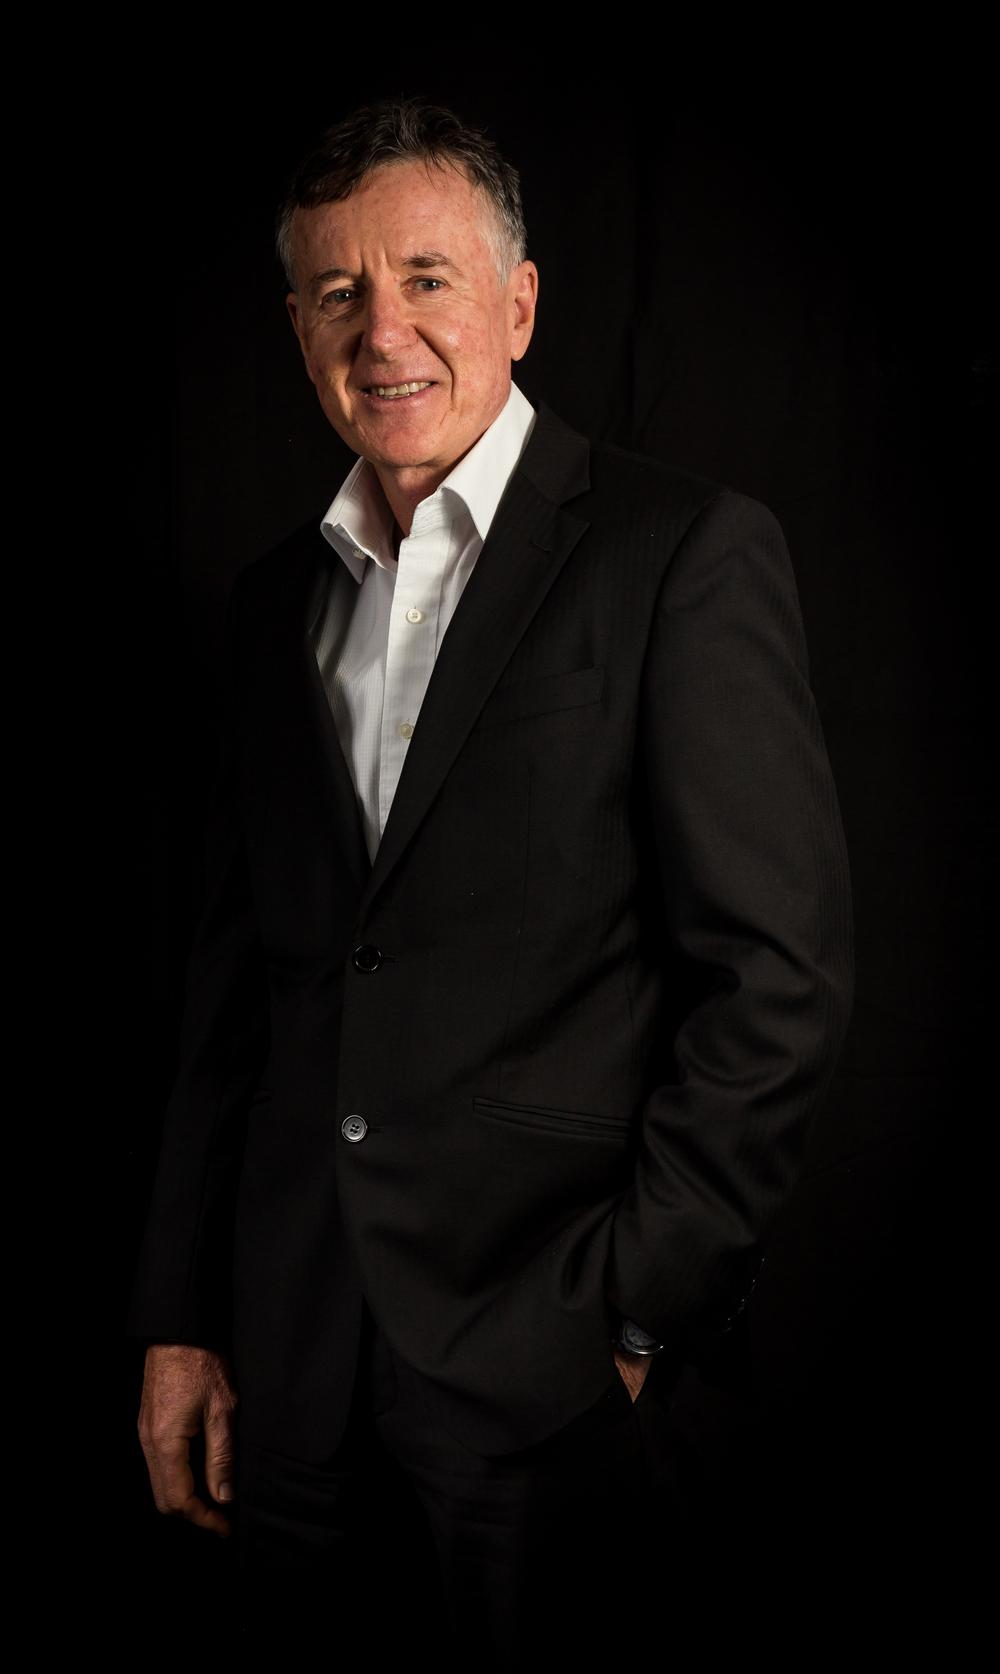 Bill Schafer  Previous senior adviser. Now retired since early 2018.